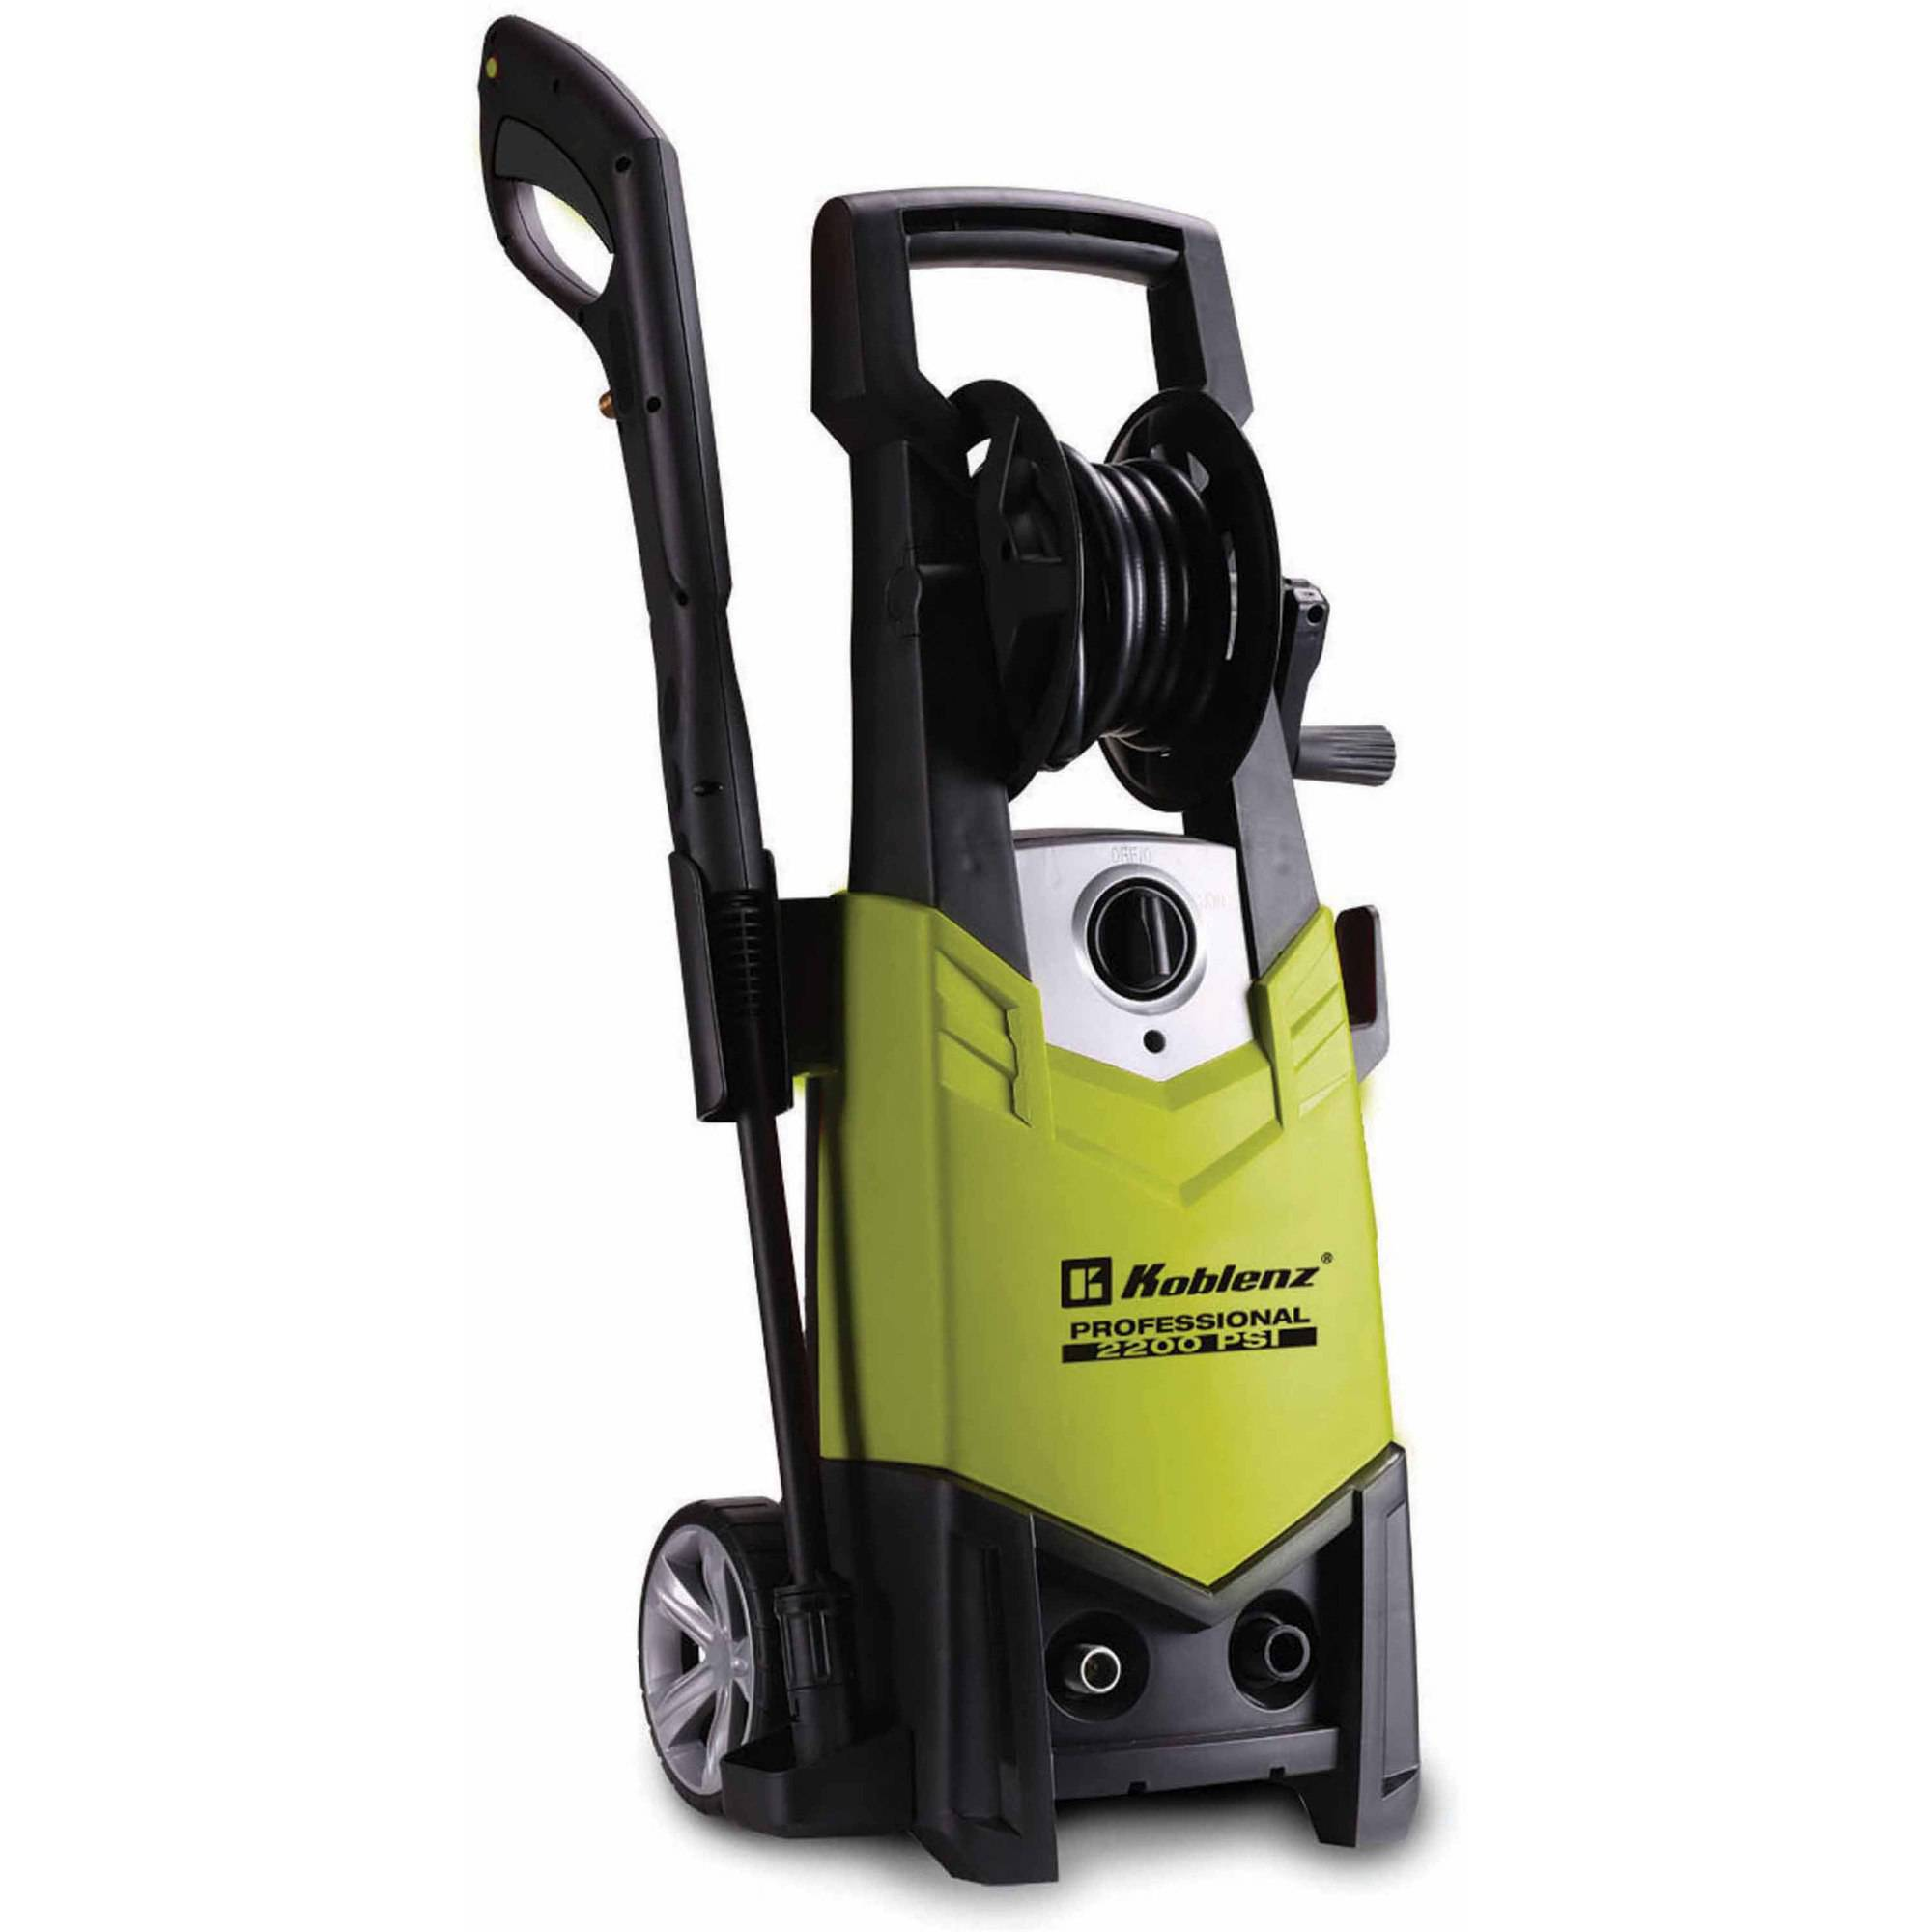 Koblenz 2200 PSI Pressure Washer, Yellow